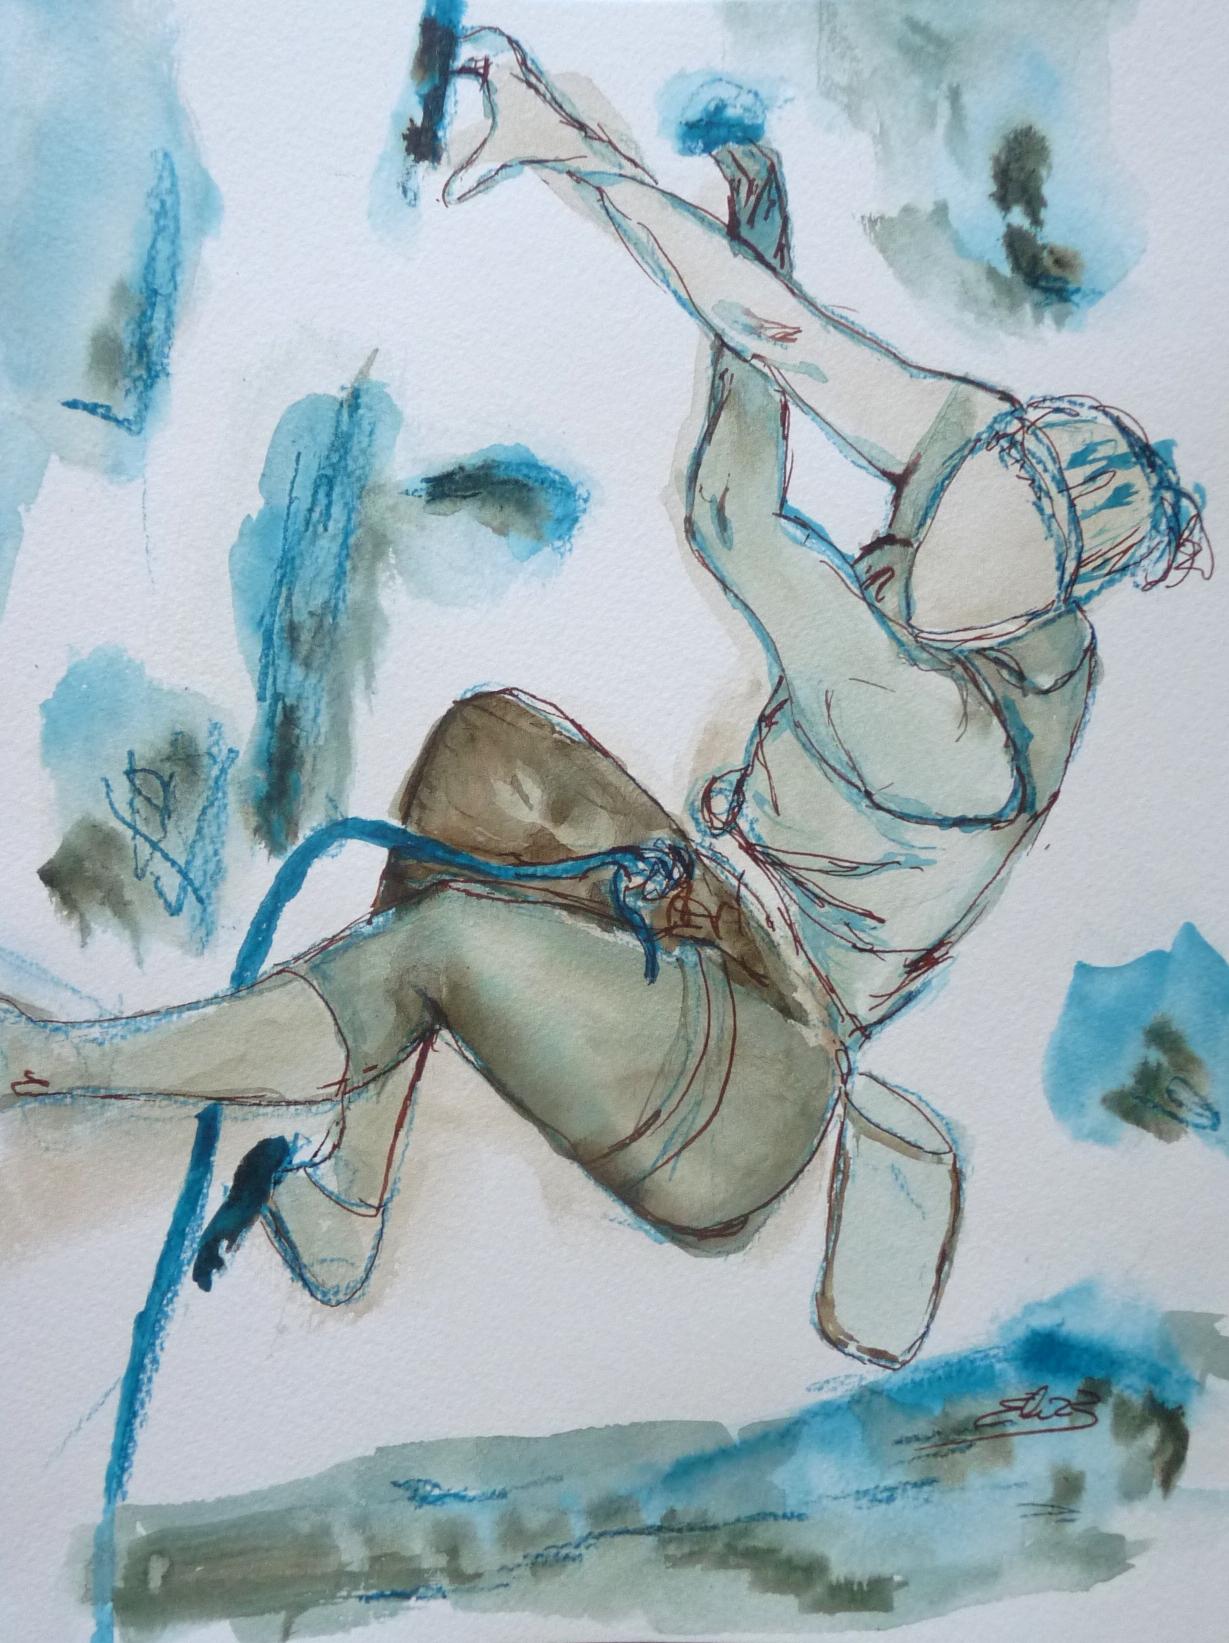 escalade grimper dessin bleu encre Elize pigmentropie